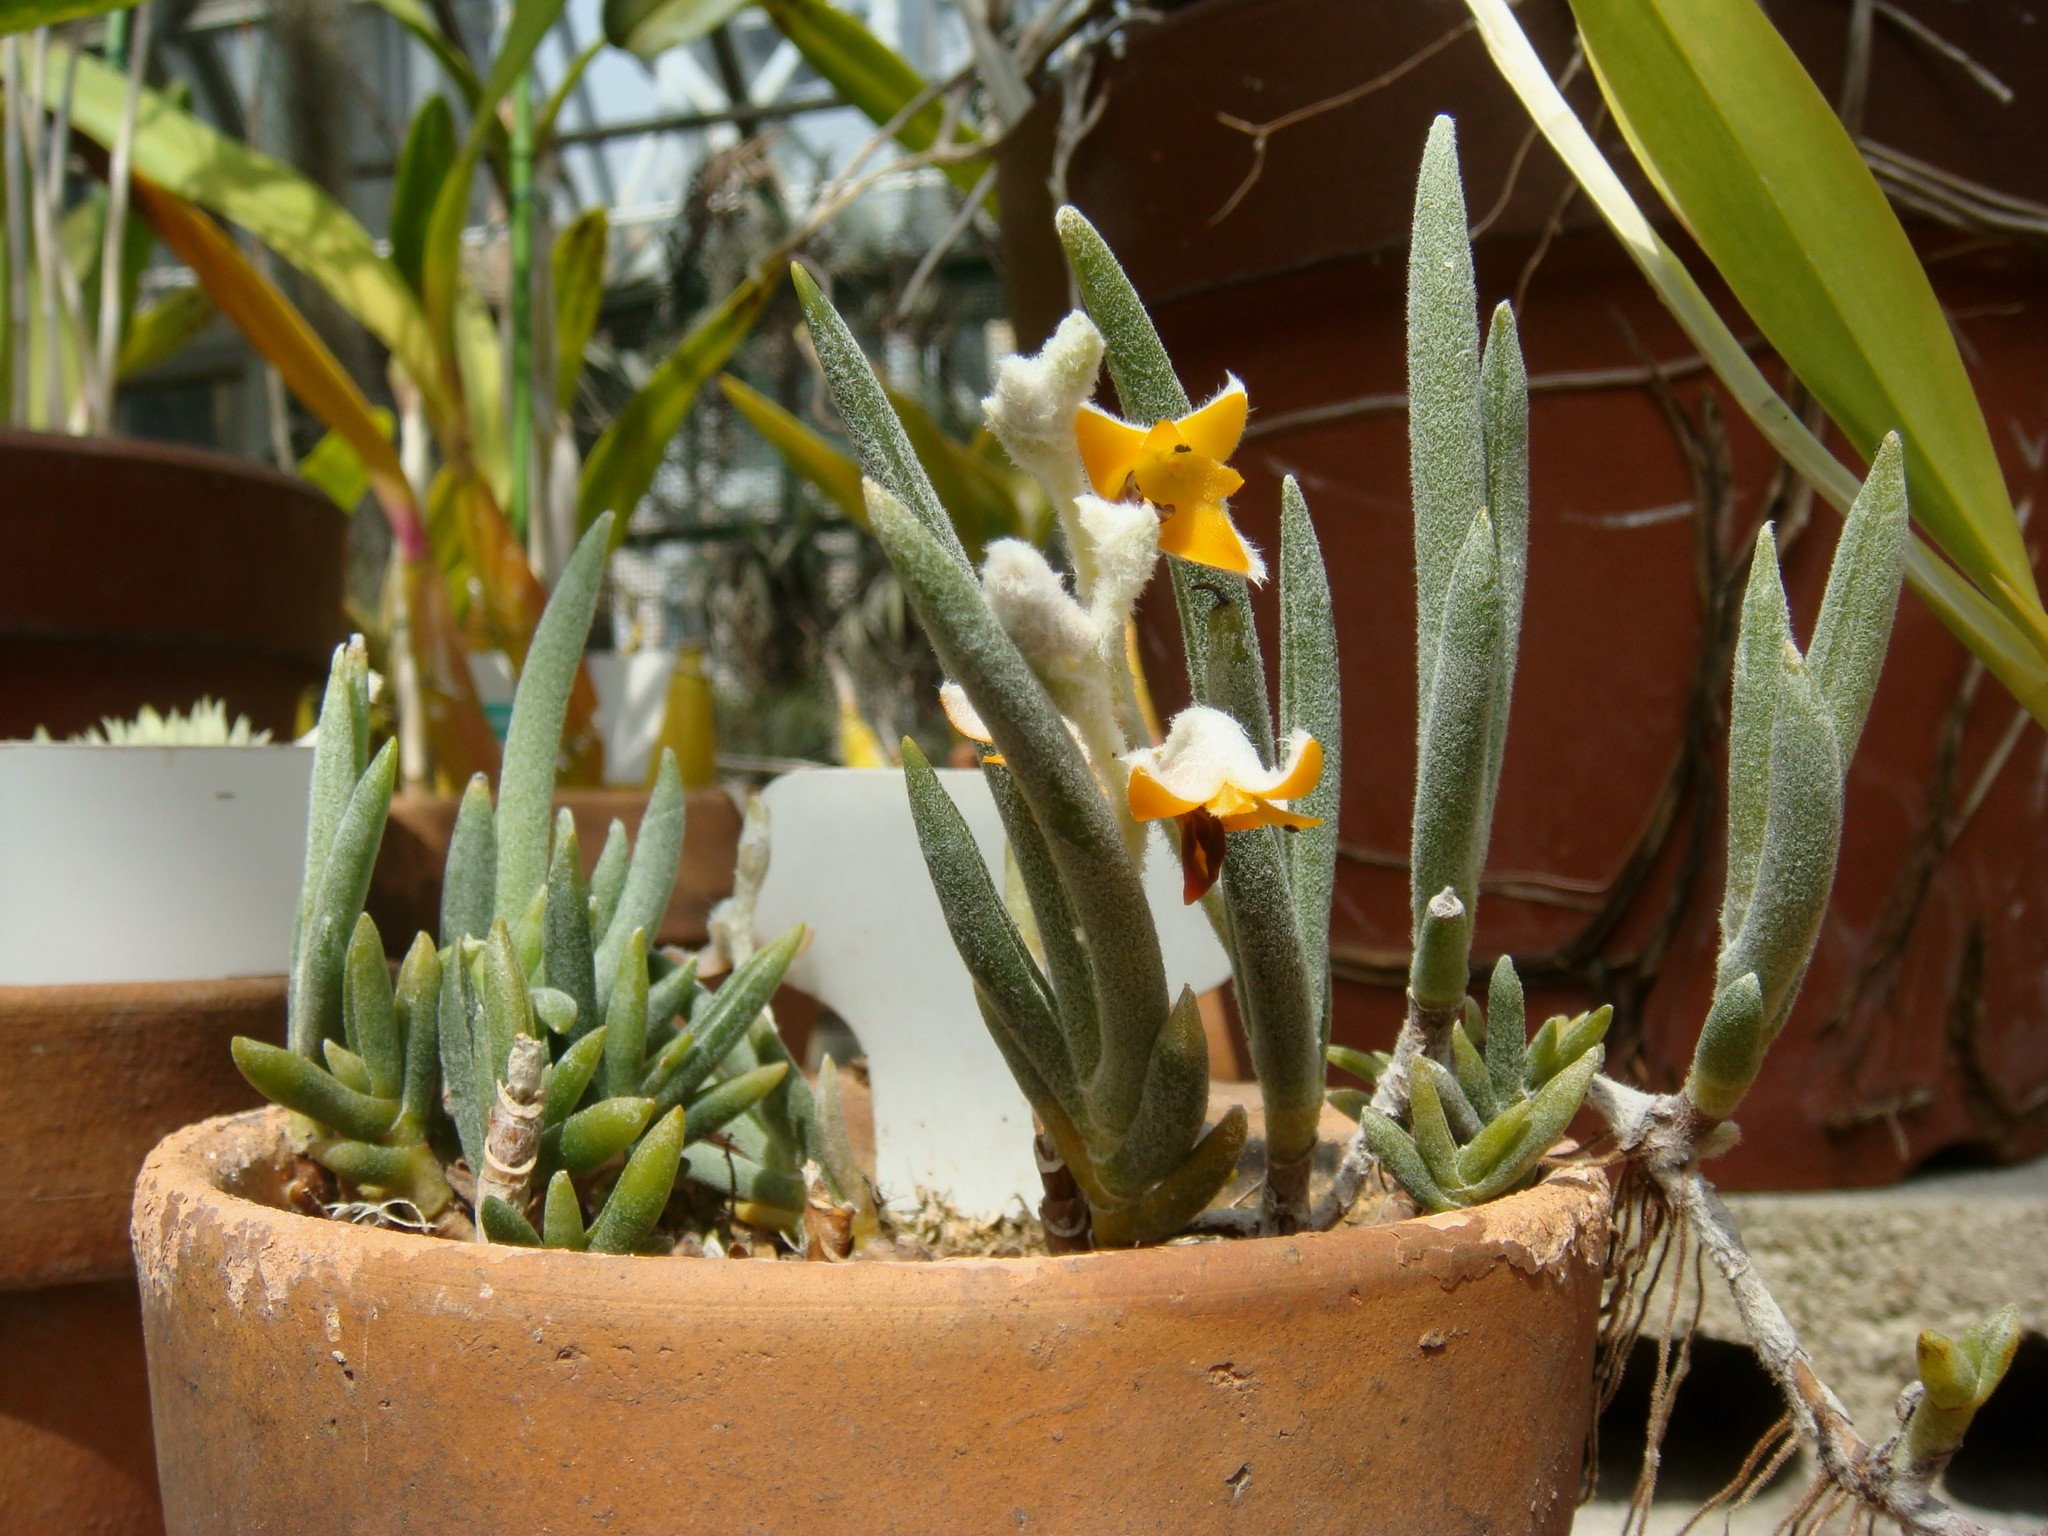 http://orchids.la.coocan.jp/Eria/Eria%20pannea/DSC01802.JPG